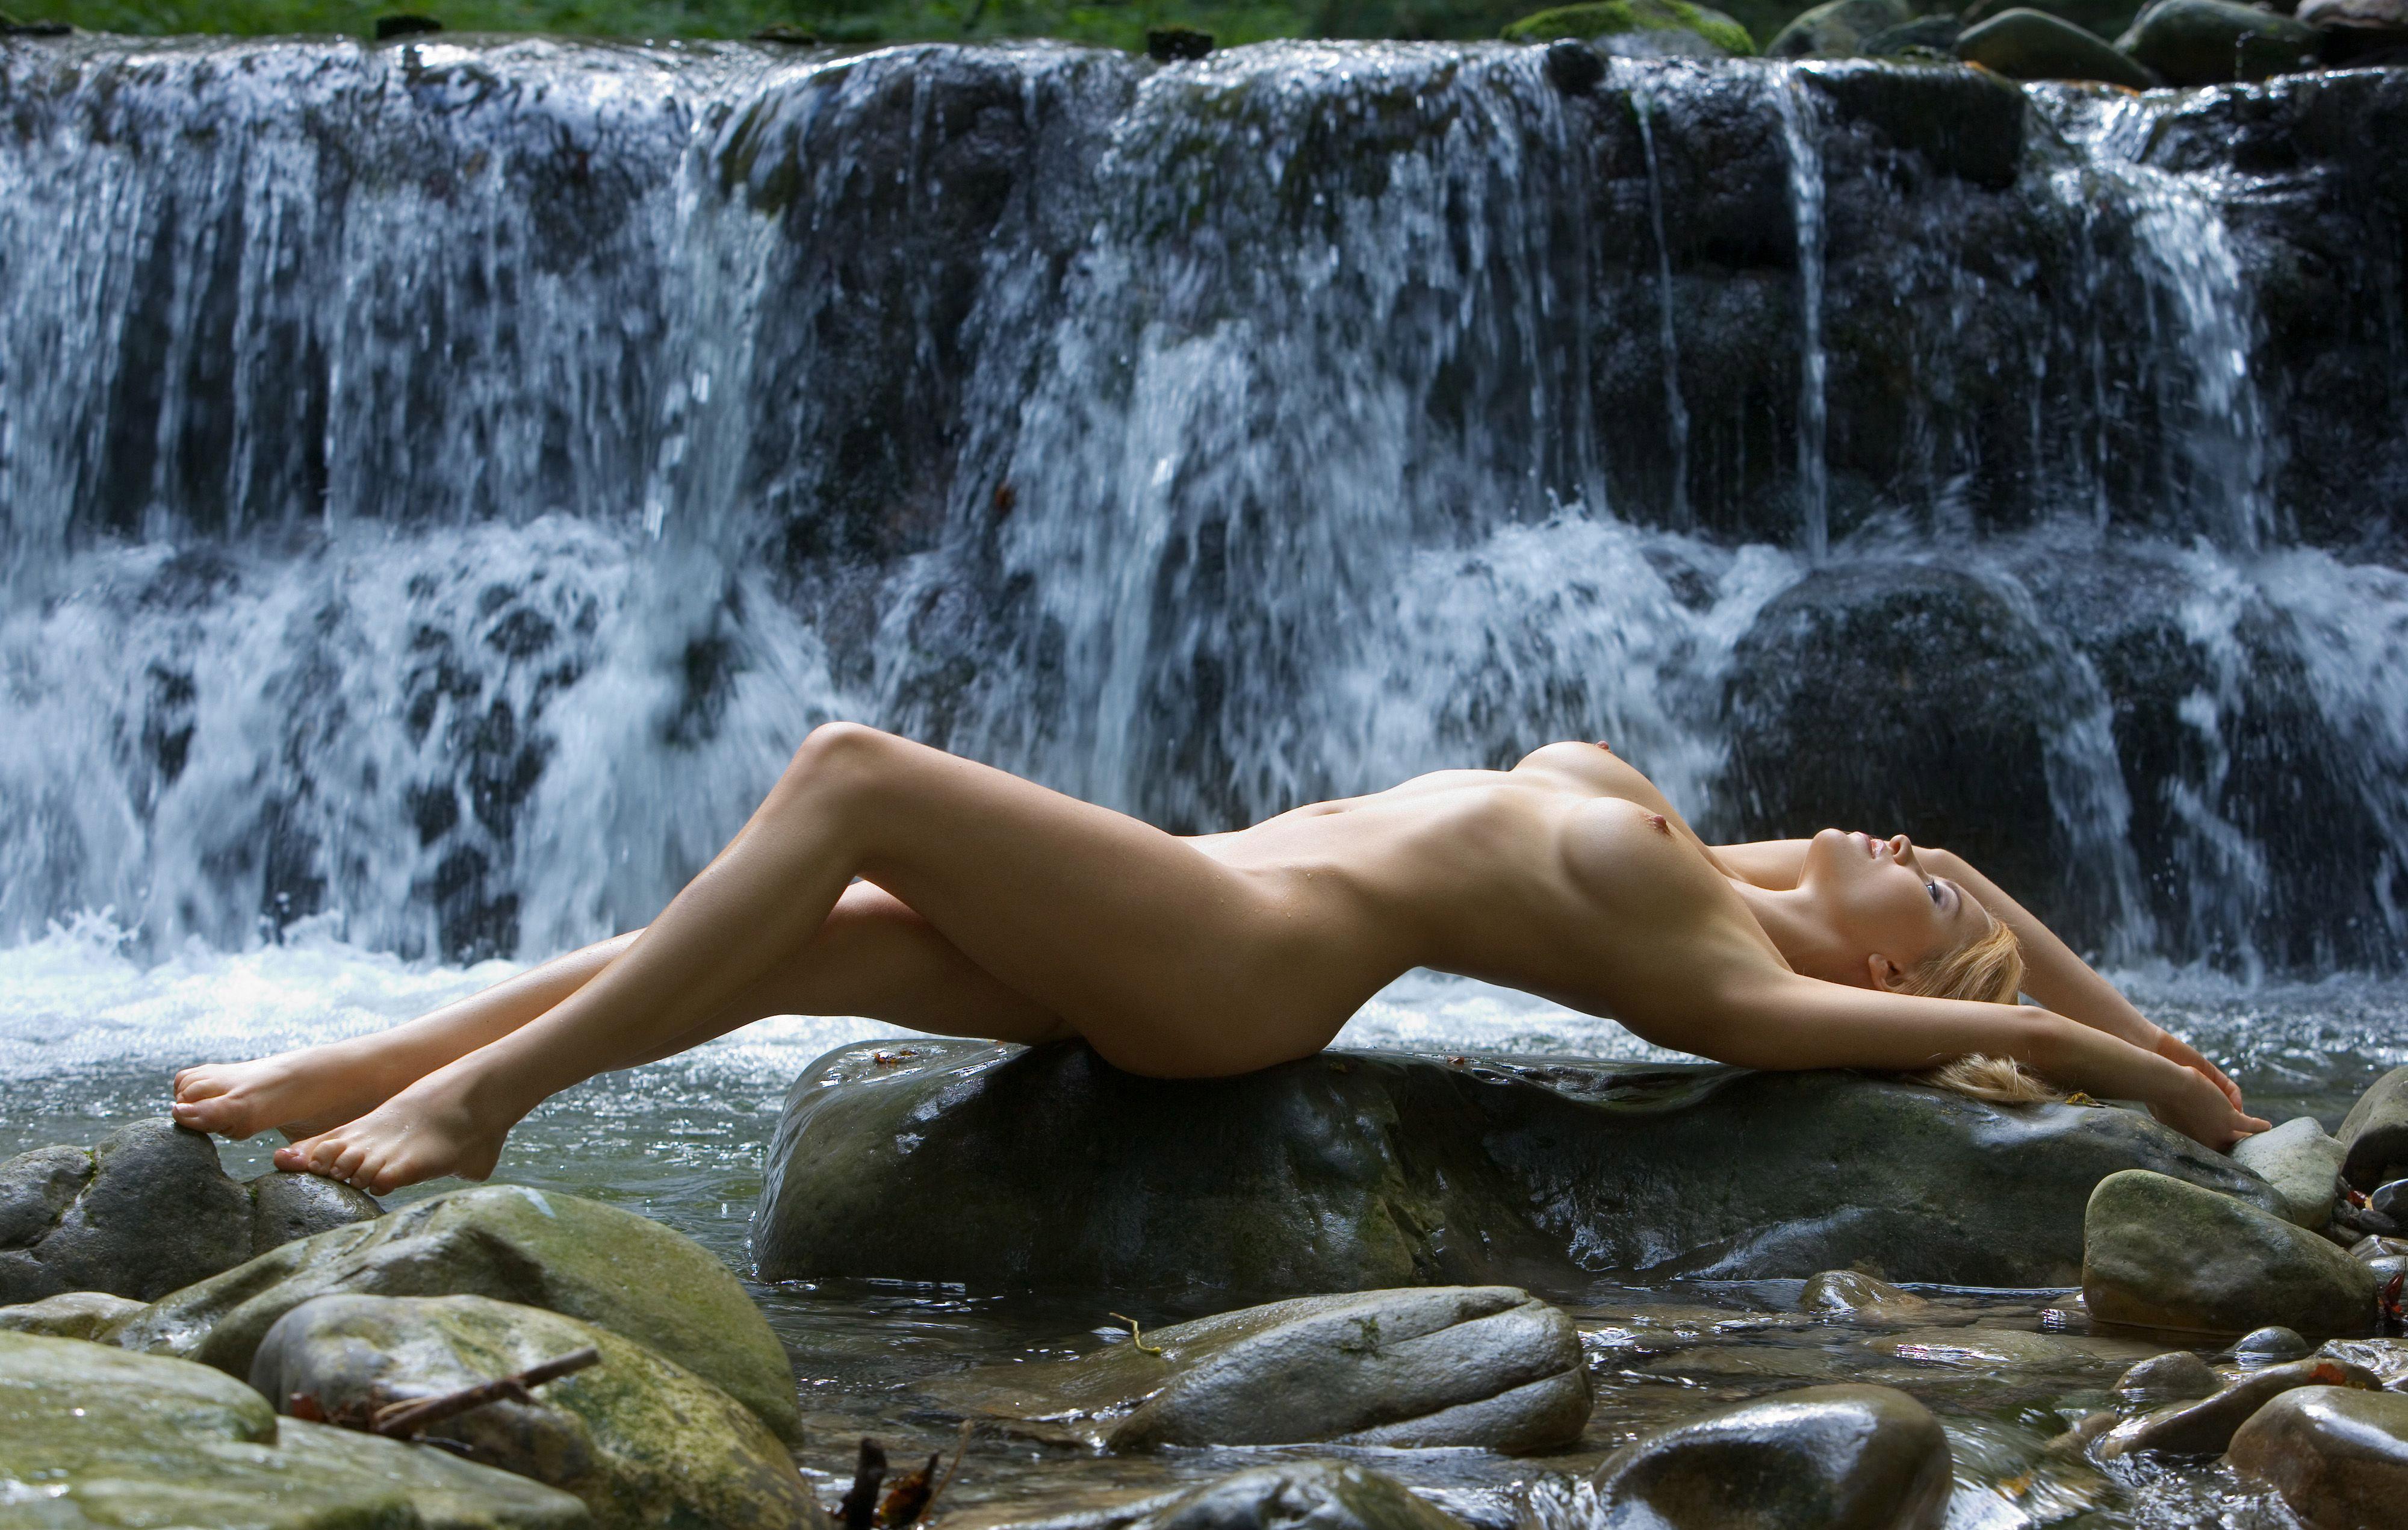 Эротика на фоне пейзажей 8 фотография